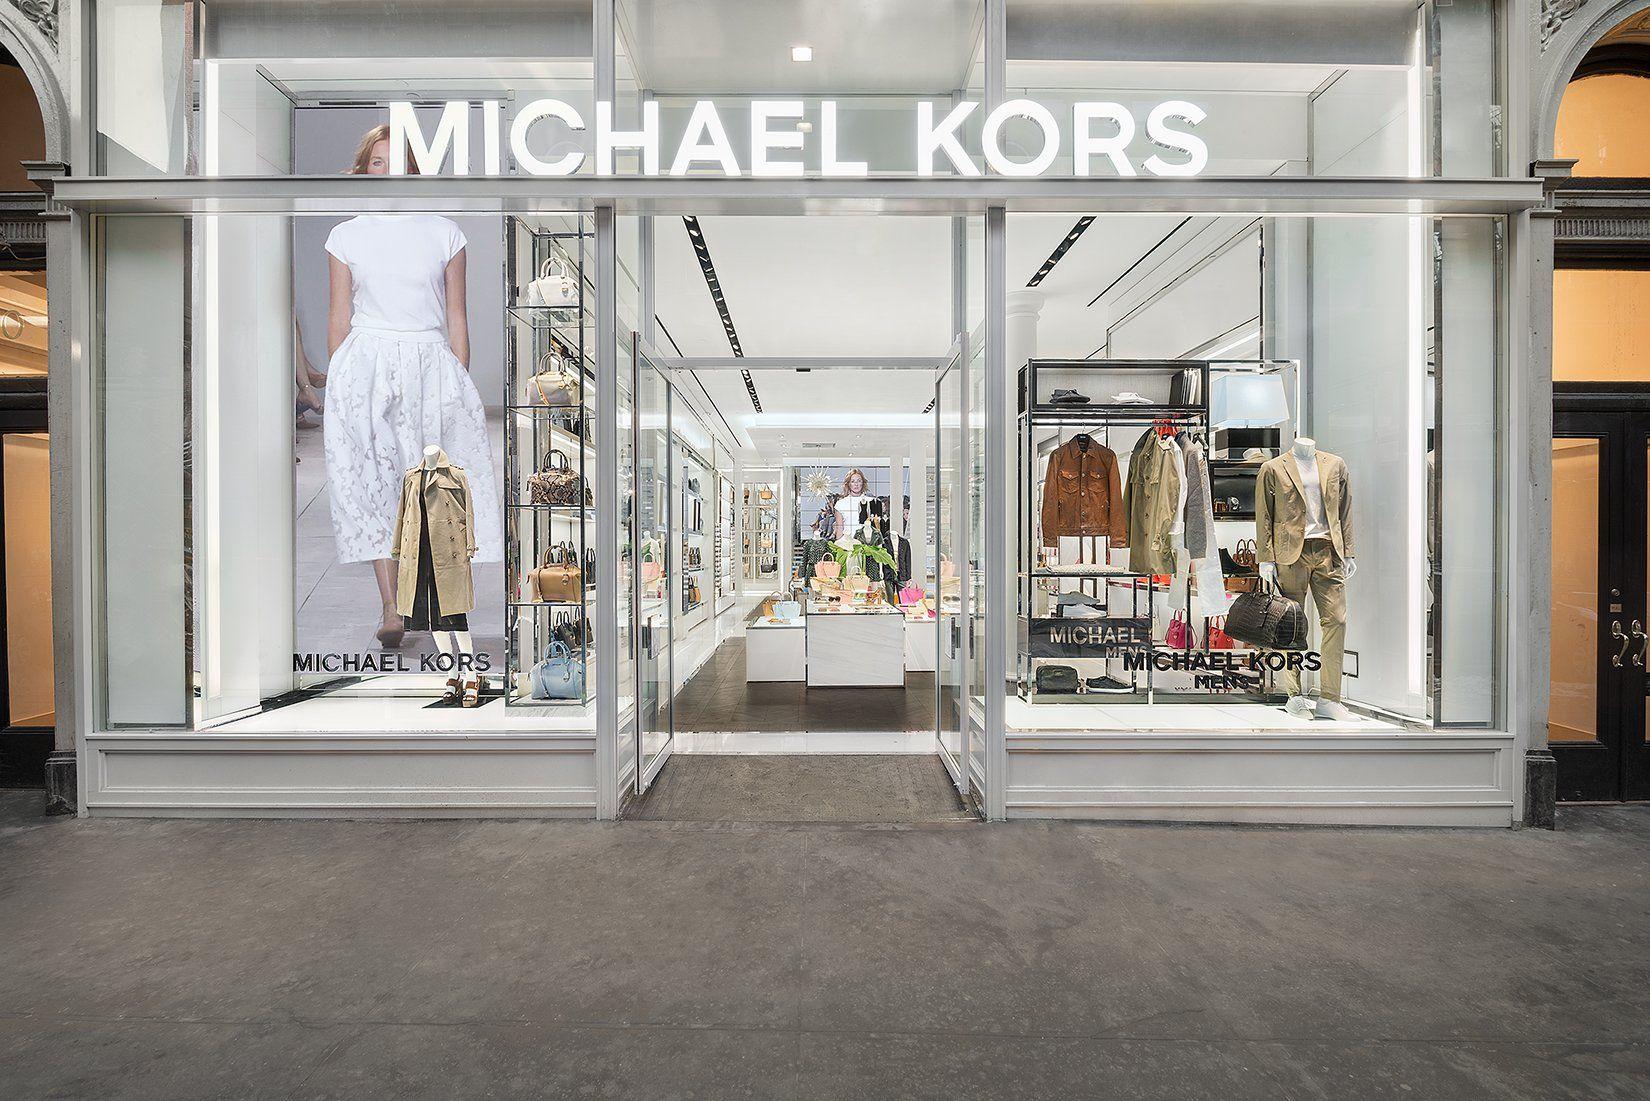 Michael Kors Store   Online shop design